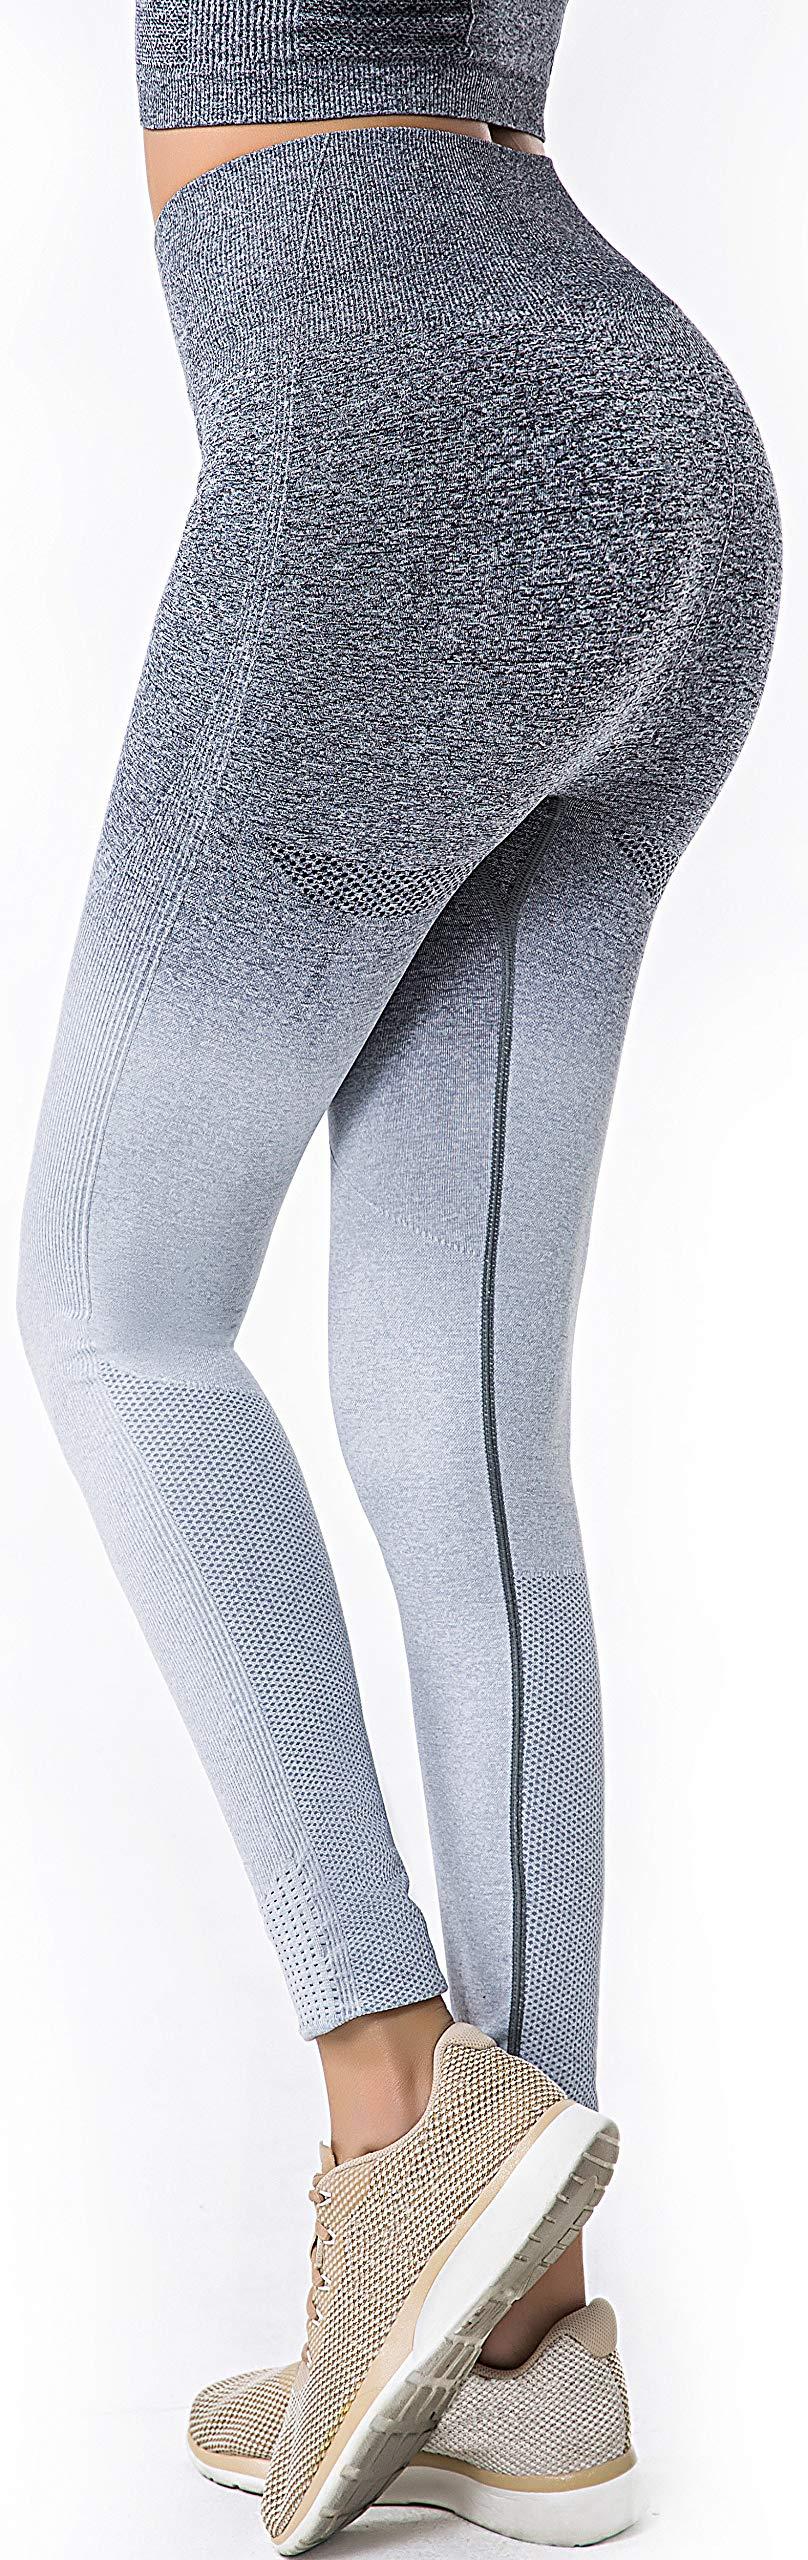 0b74414863cb2 RUNNING GIRL Ombre Seamless Gym Leggings Power Stretch High Waisted Yoga  Pants ...